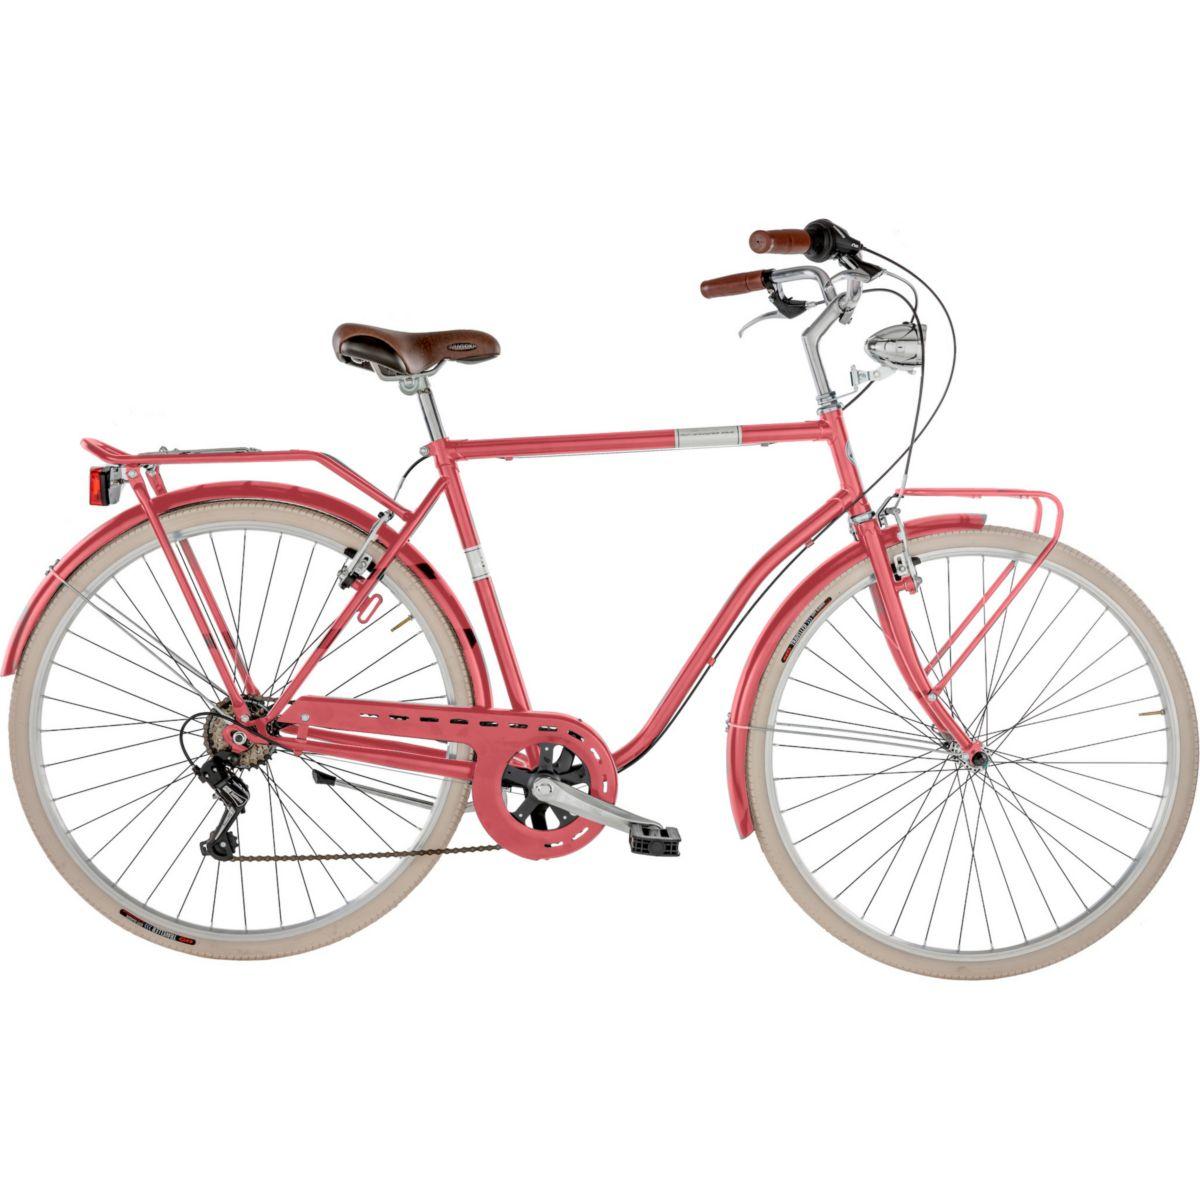 28 Zoll Herren City Fahrrad 6 Gang Alpina Viaggio Man rot